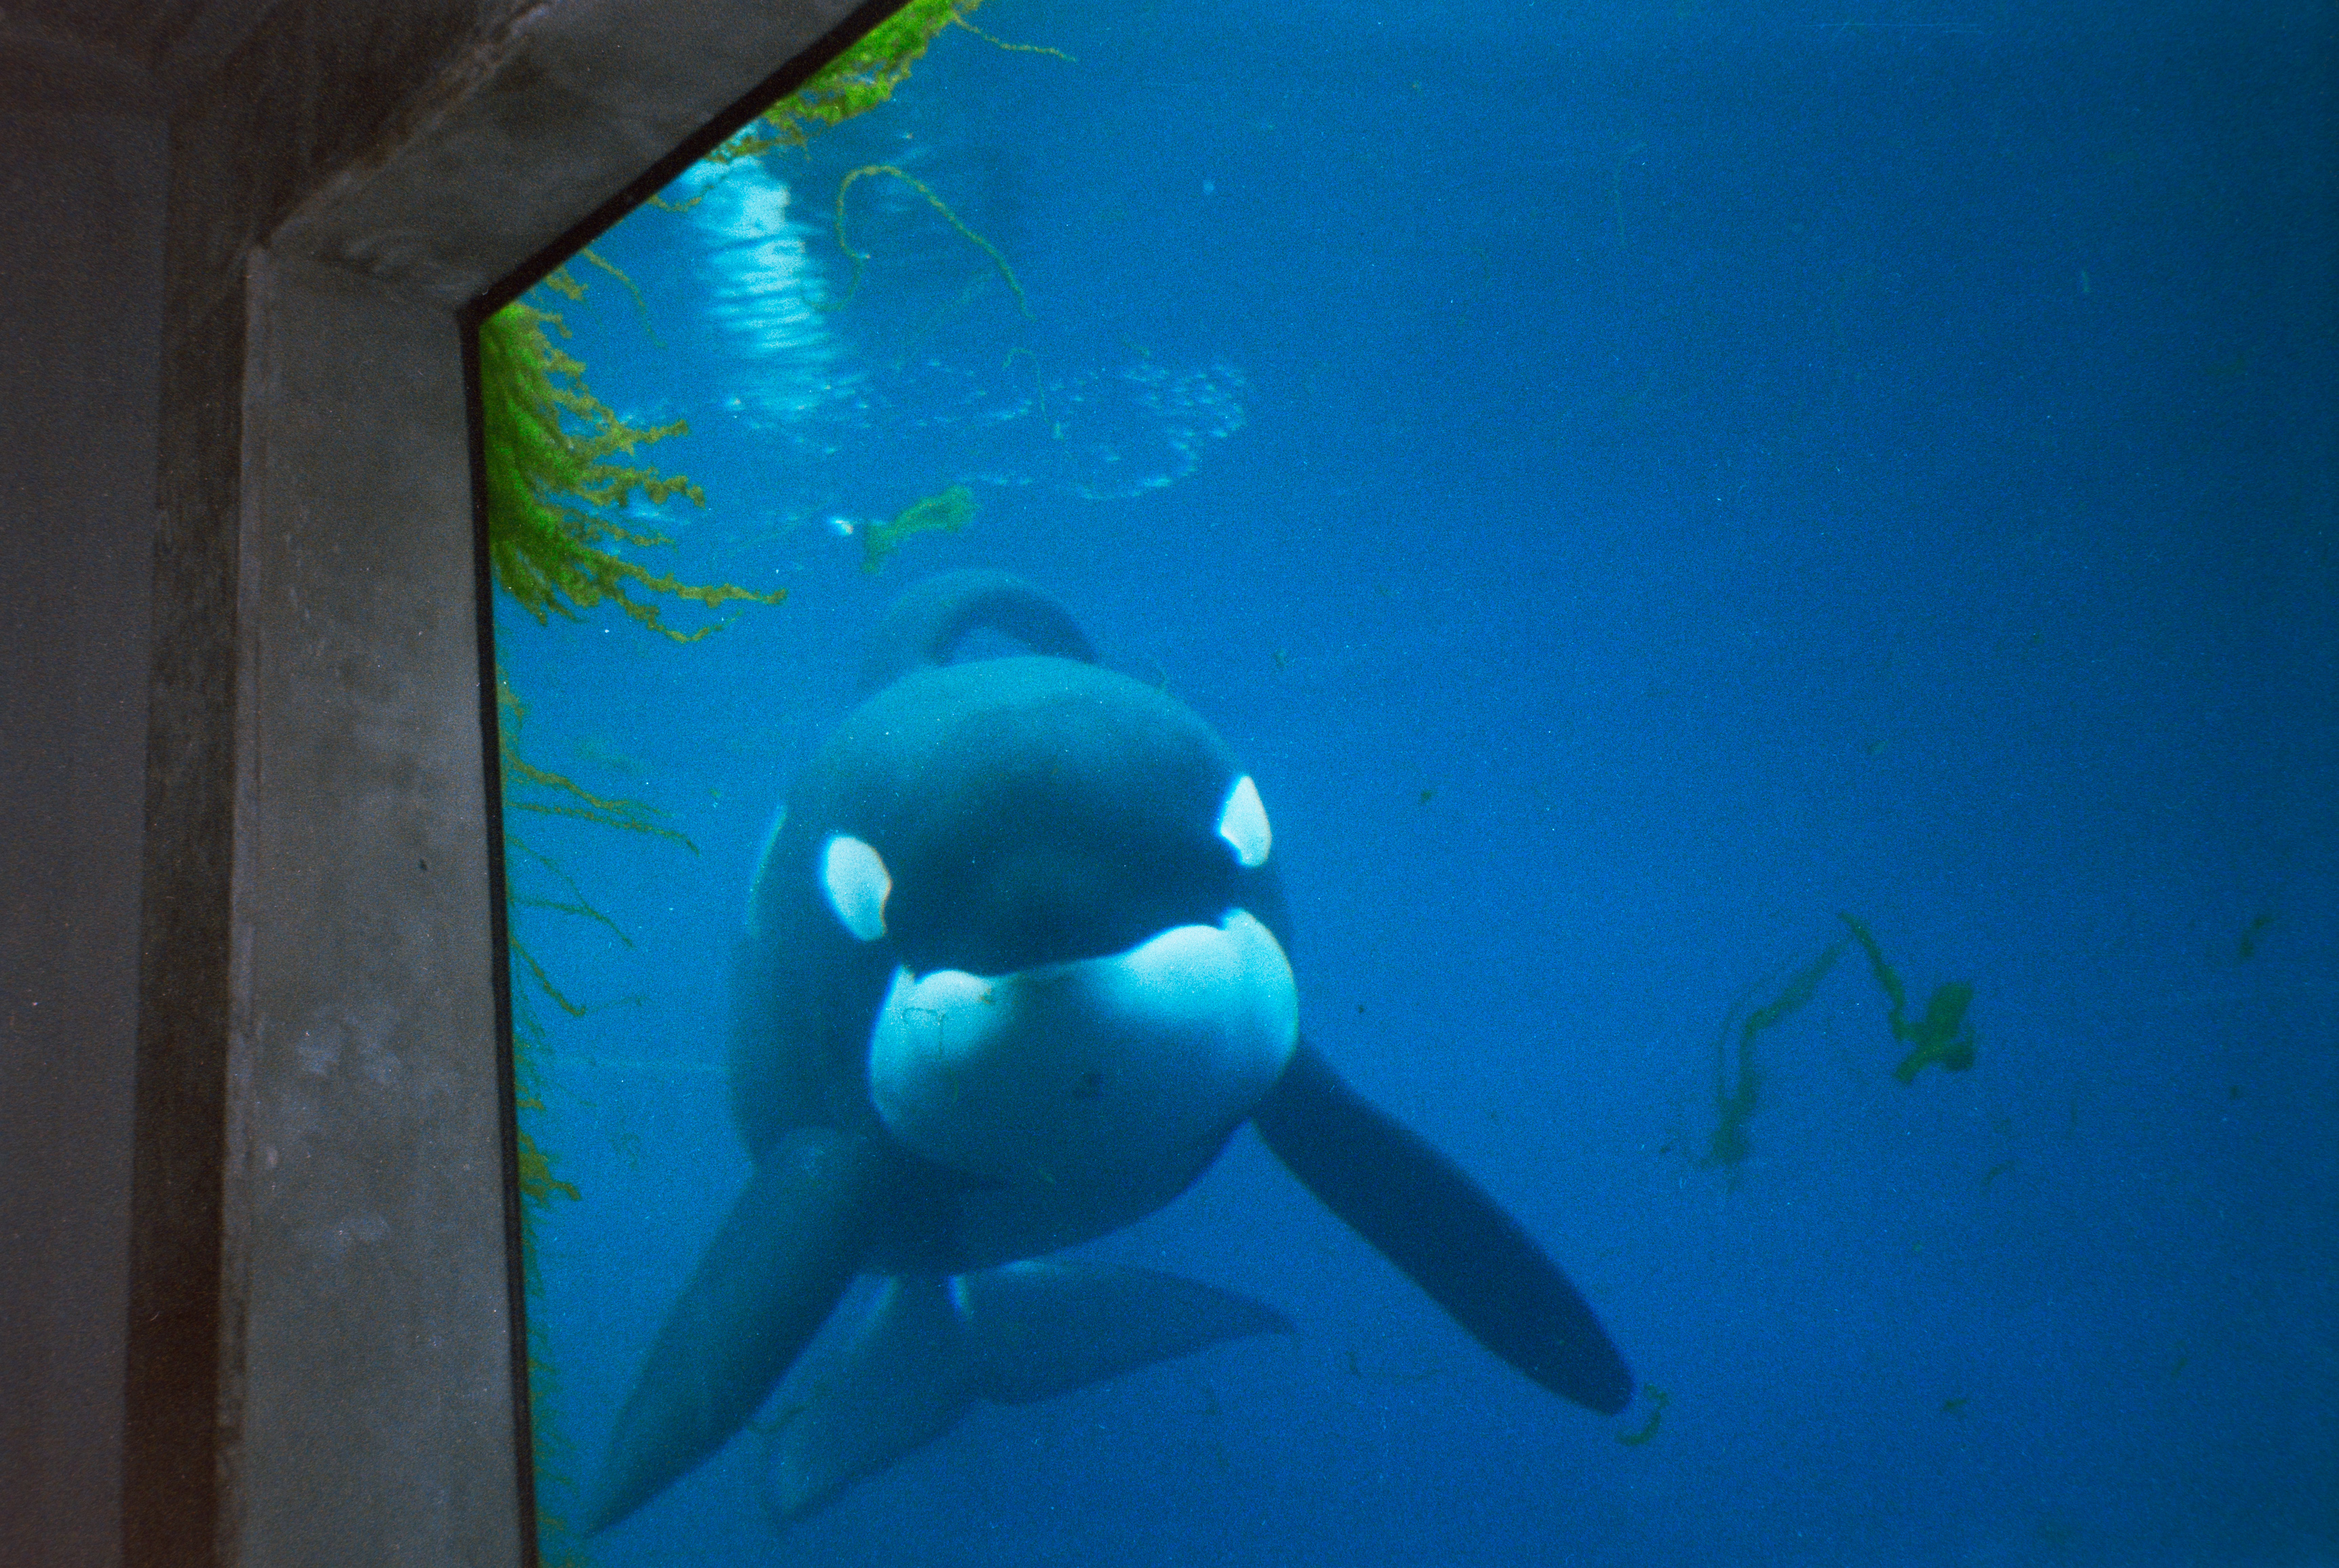 Keiko the famous orca